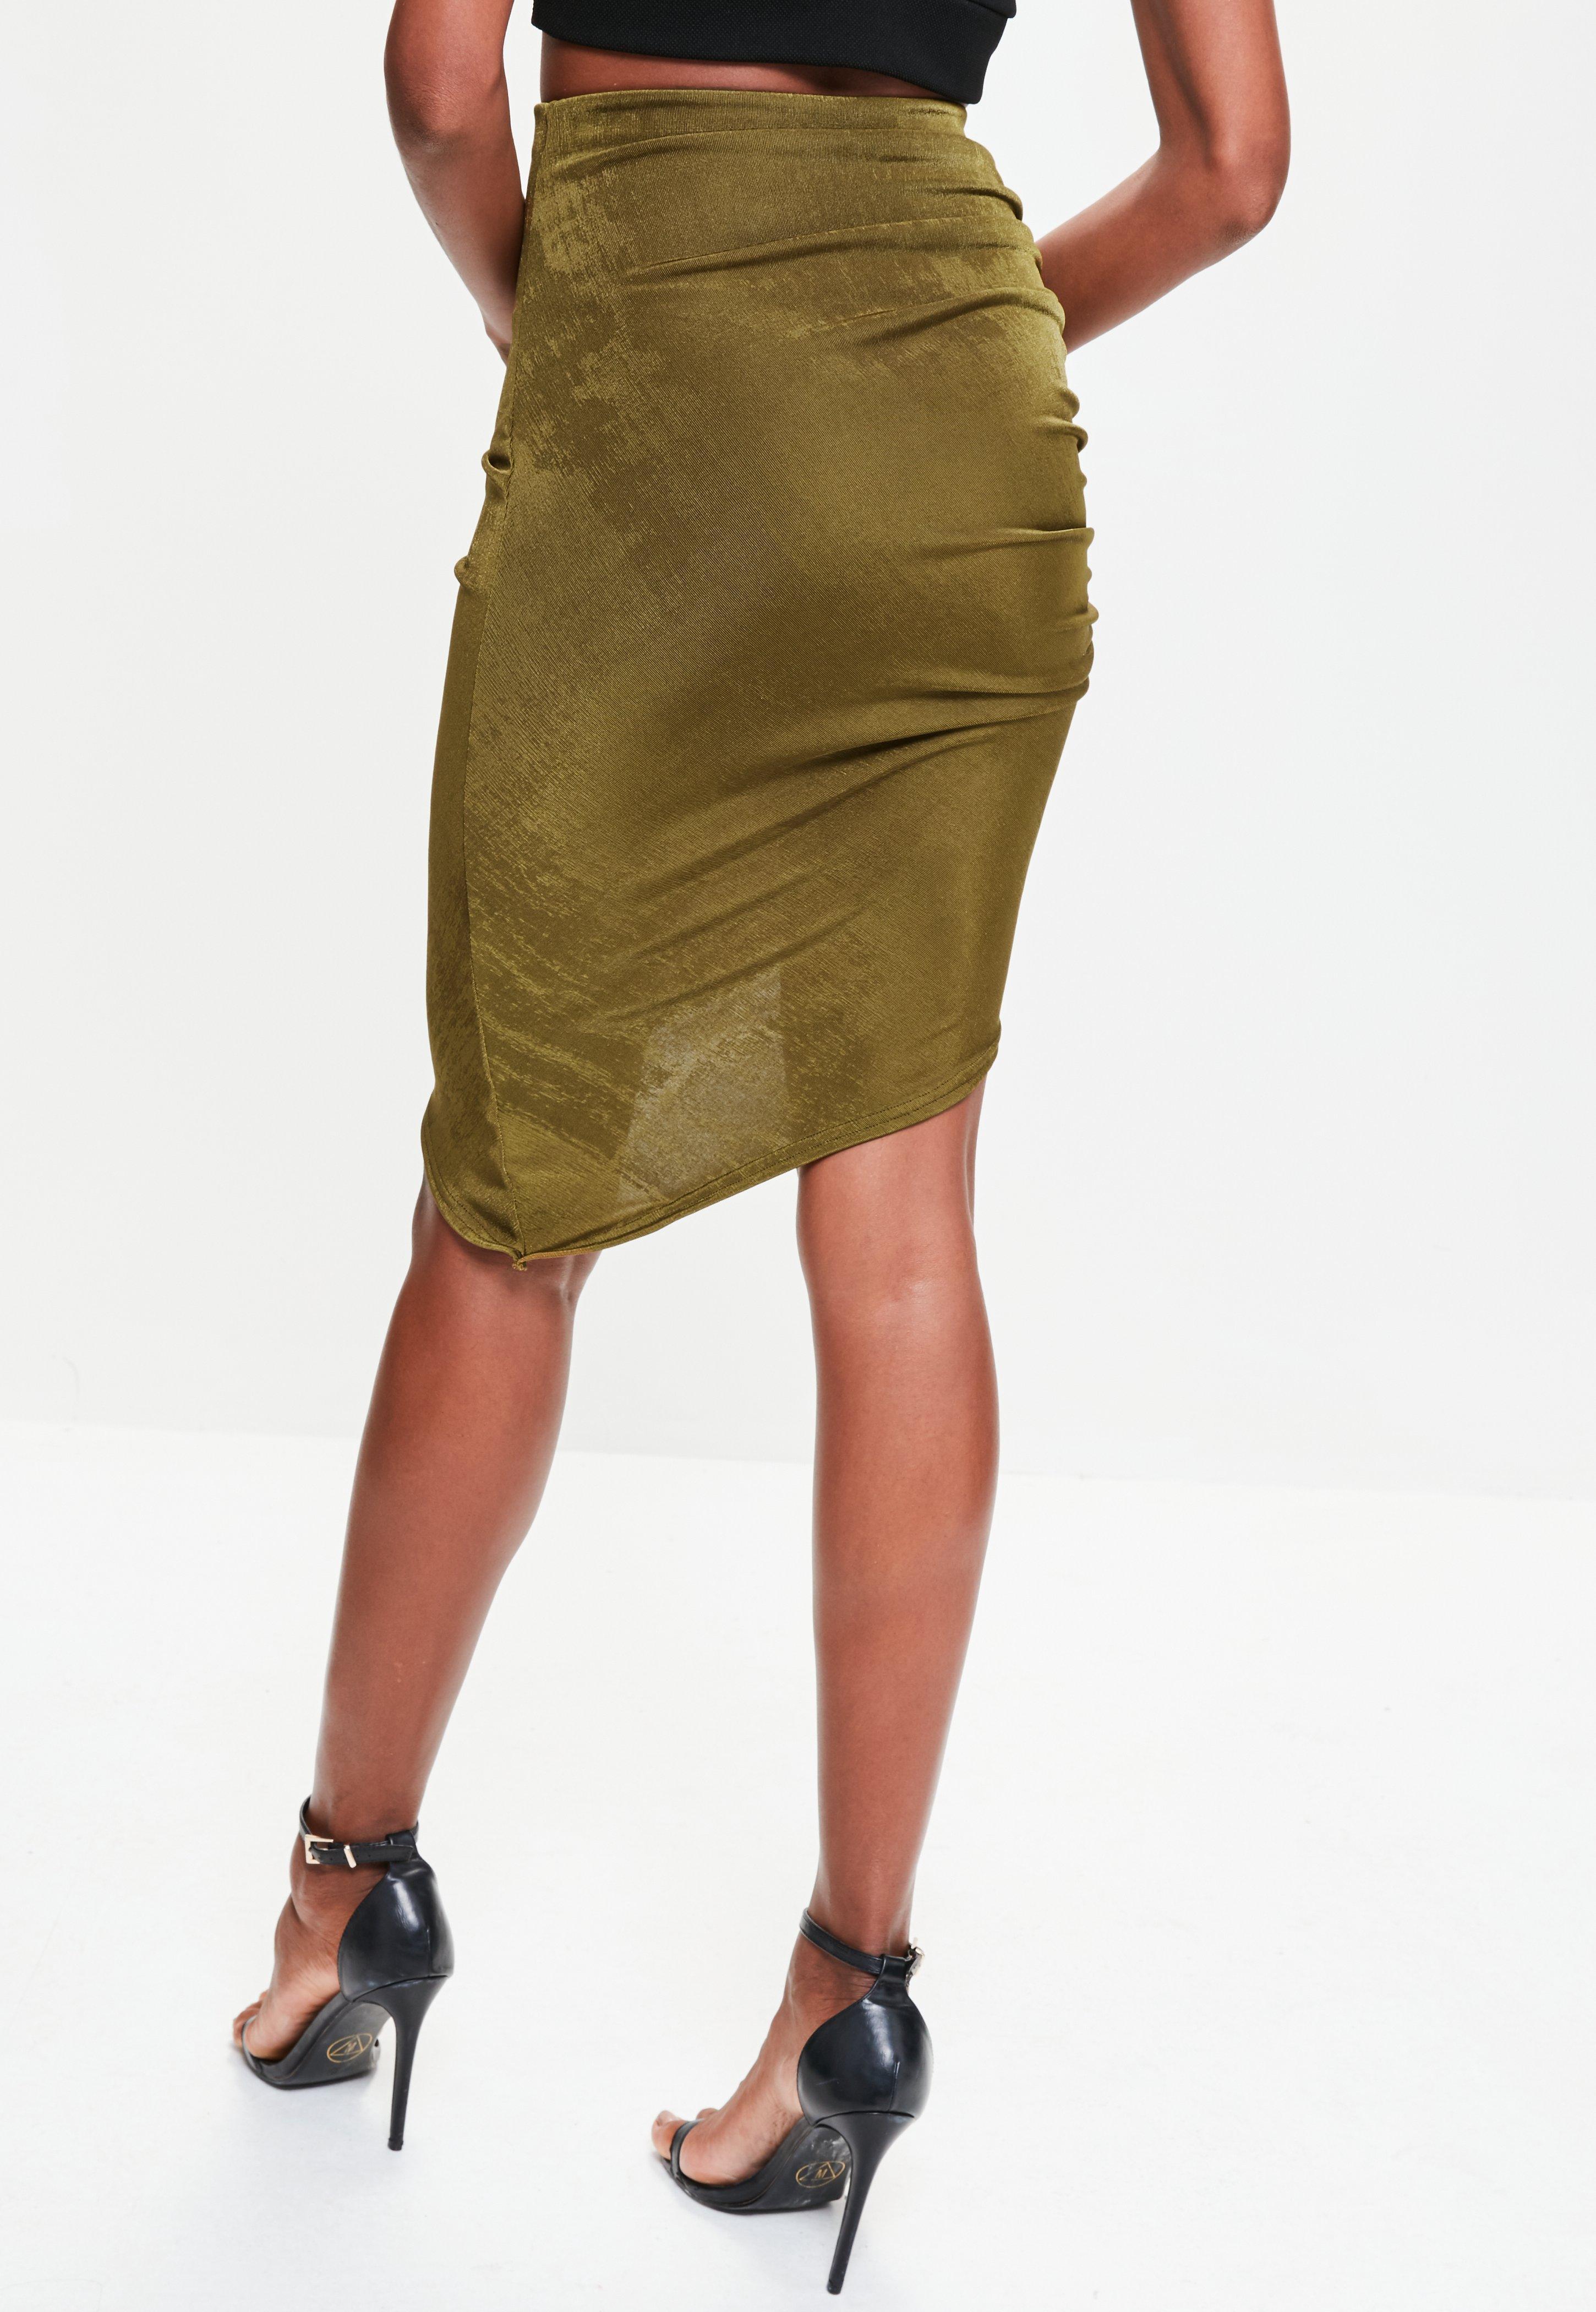 b200d0fcb3 Lyst - Missguided Khaki Asymmetric Ruched Side Slinky Midi Skirt in ...